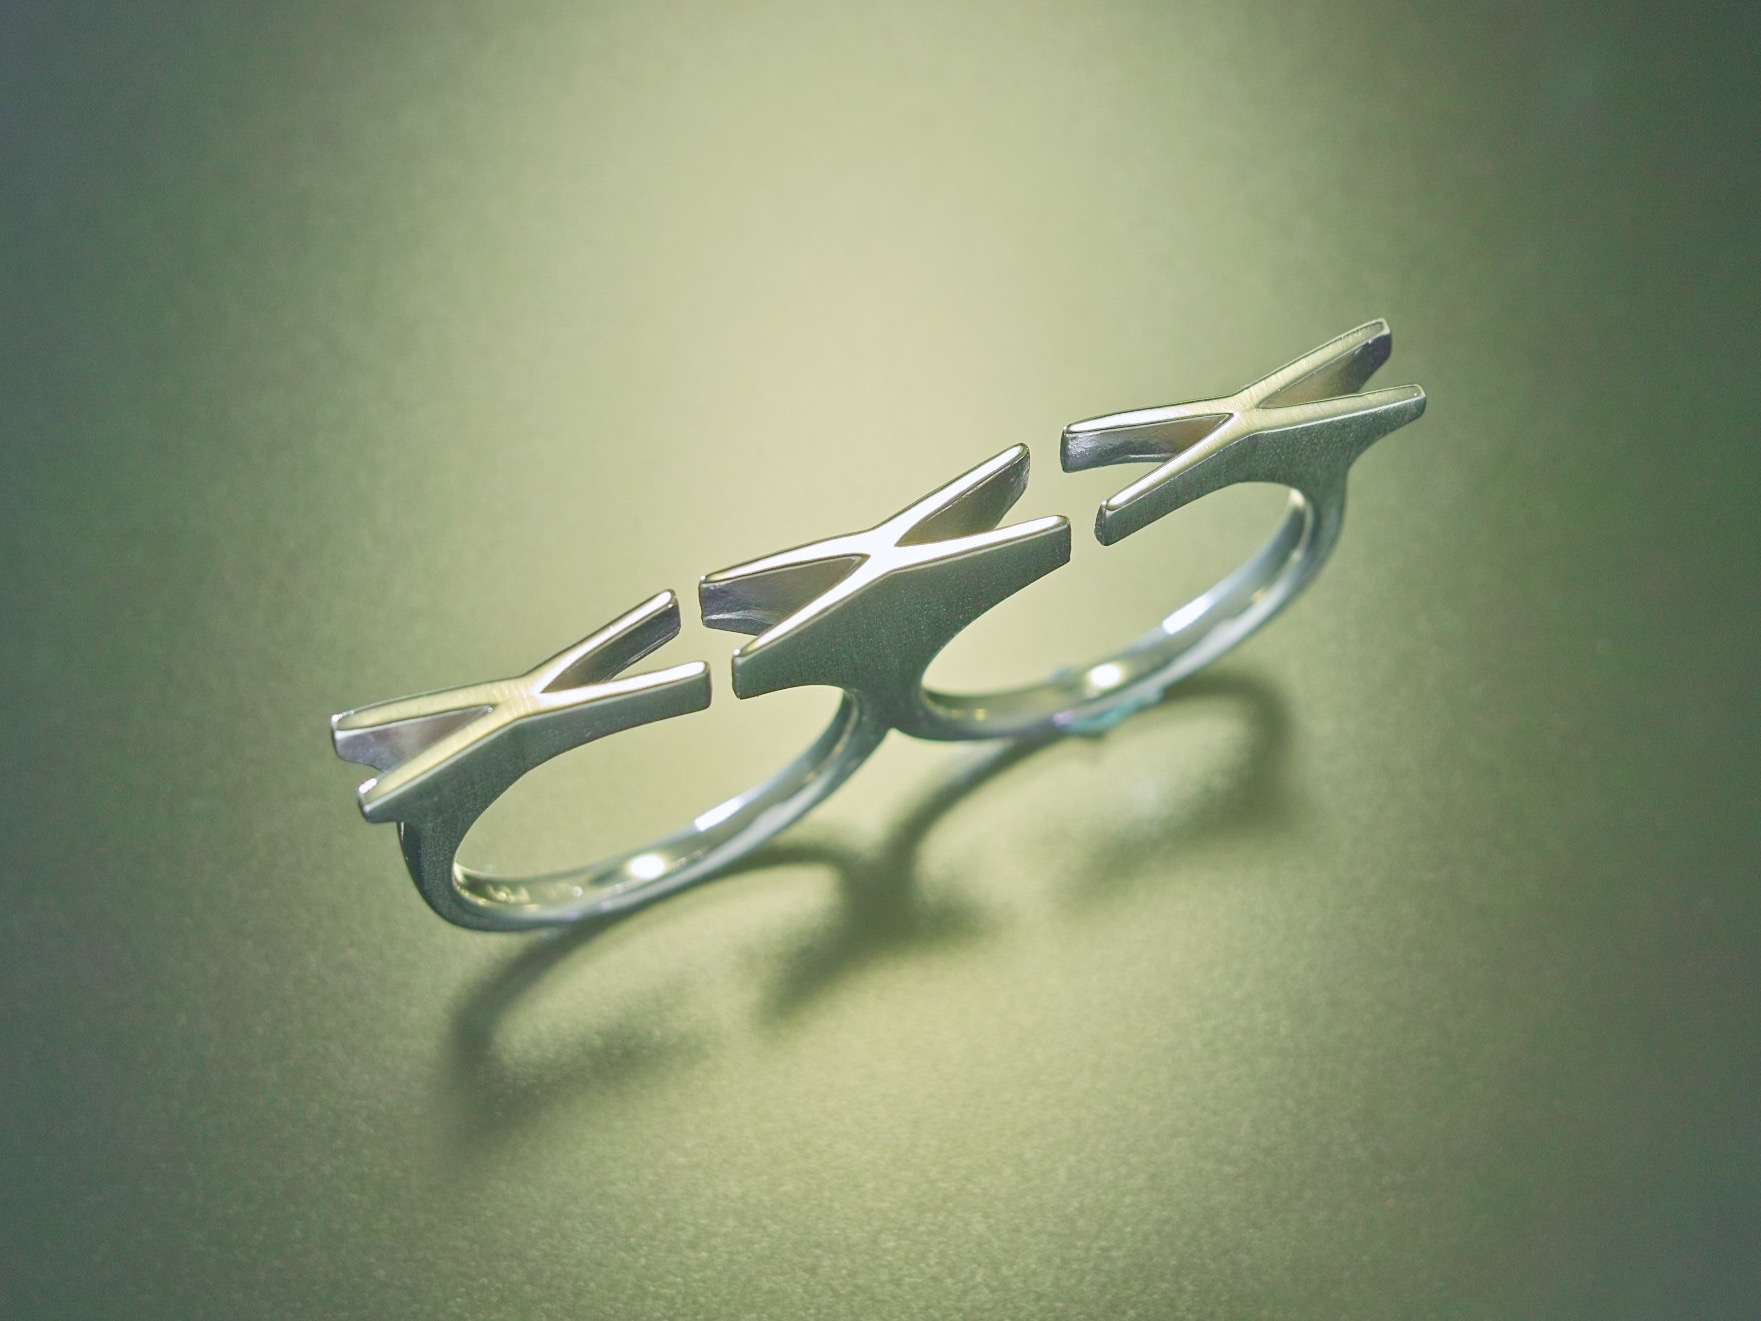 2Finger LOVE Ring『KISS KISS KISS』Silver925